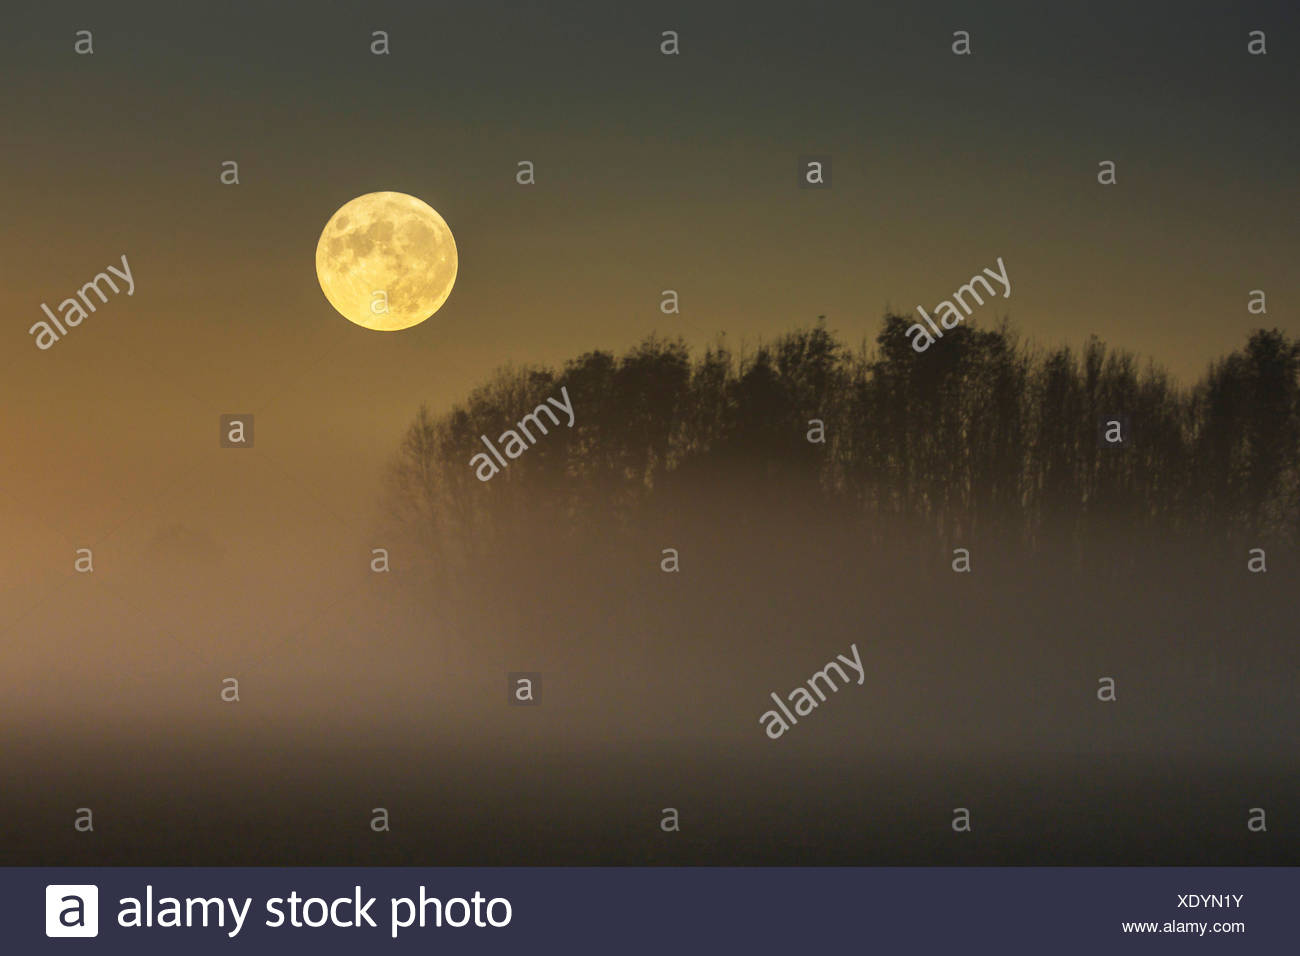 Vollmond ueber im Moor aufsteigendem Bodennebel, Deutschland, Bayern, Grabenstaetter Moor   full moon over ascending mist on moo - Stock Image